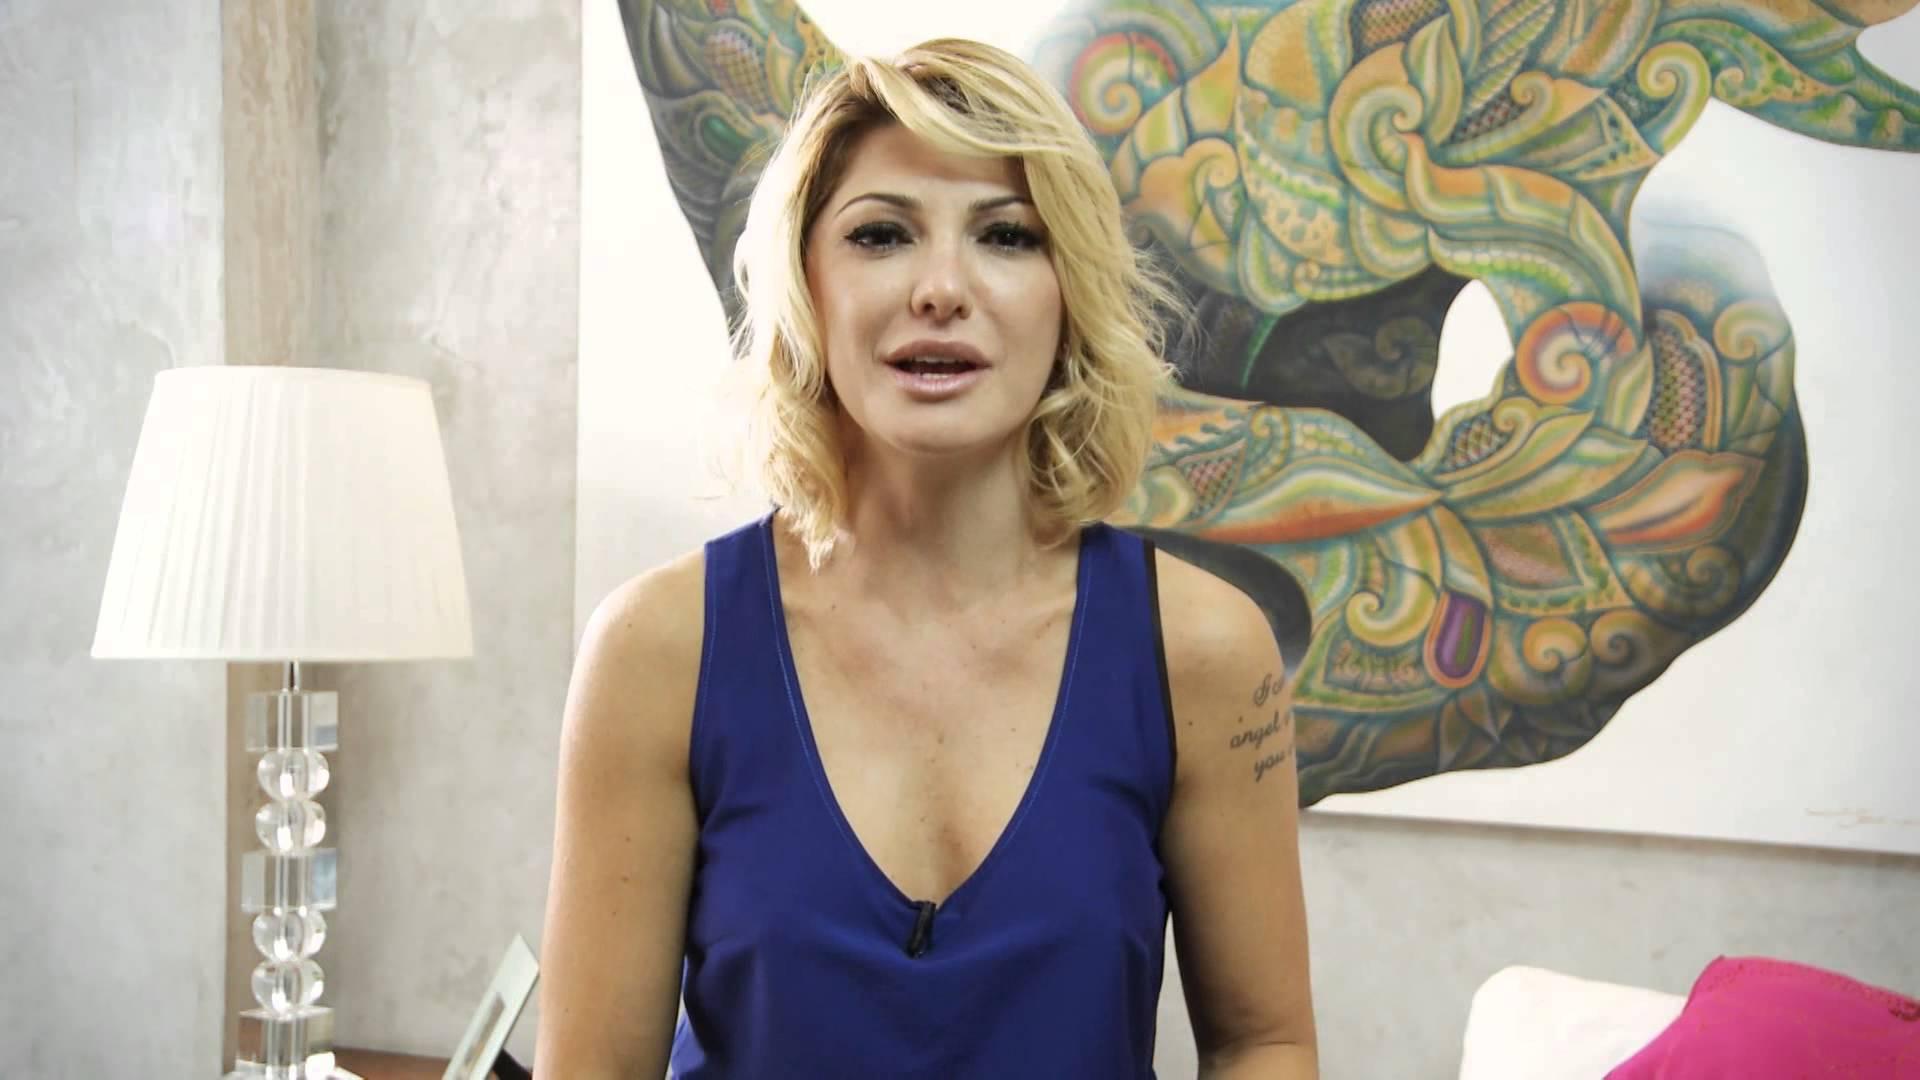 Vídeo: Antônia Fontenelle e Lívia Andrade batem boca no Instagram